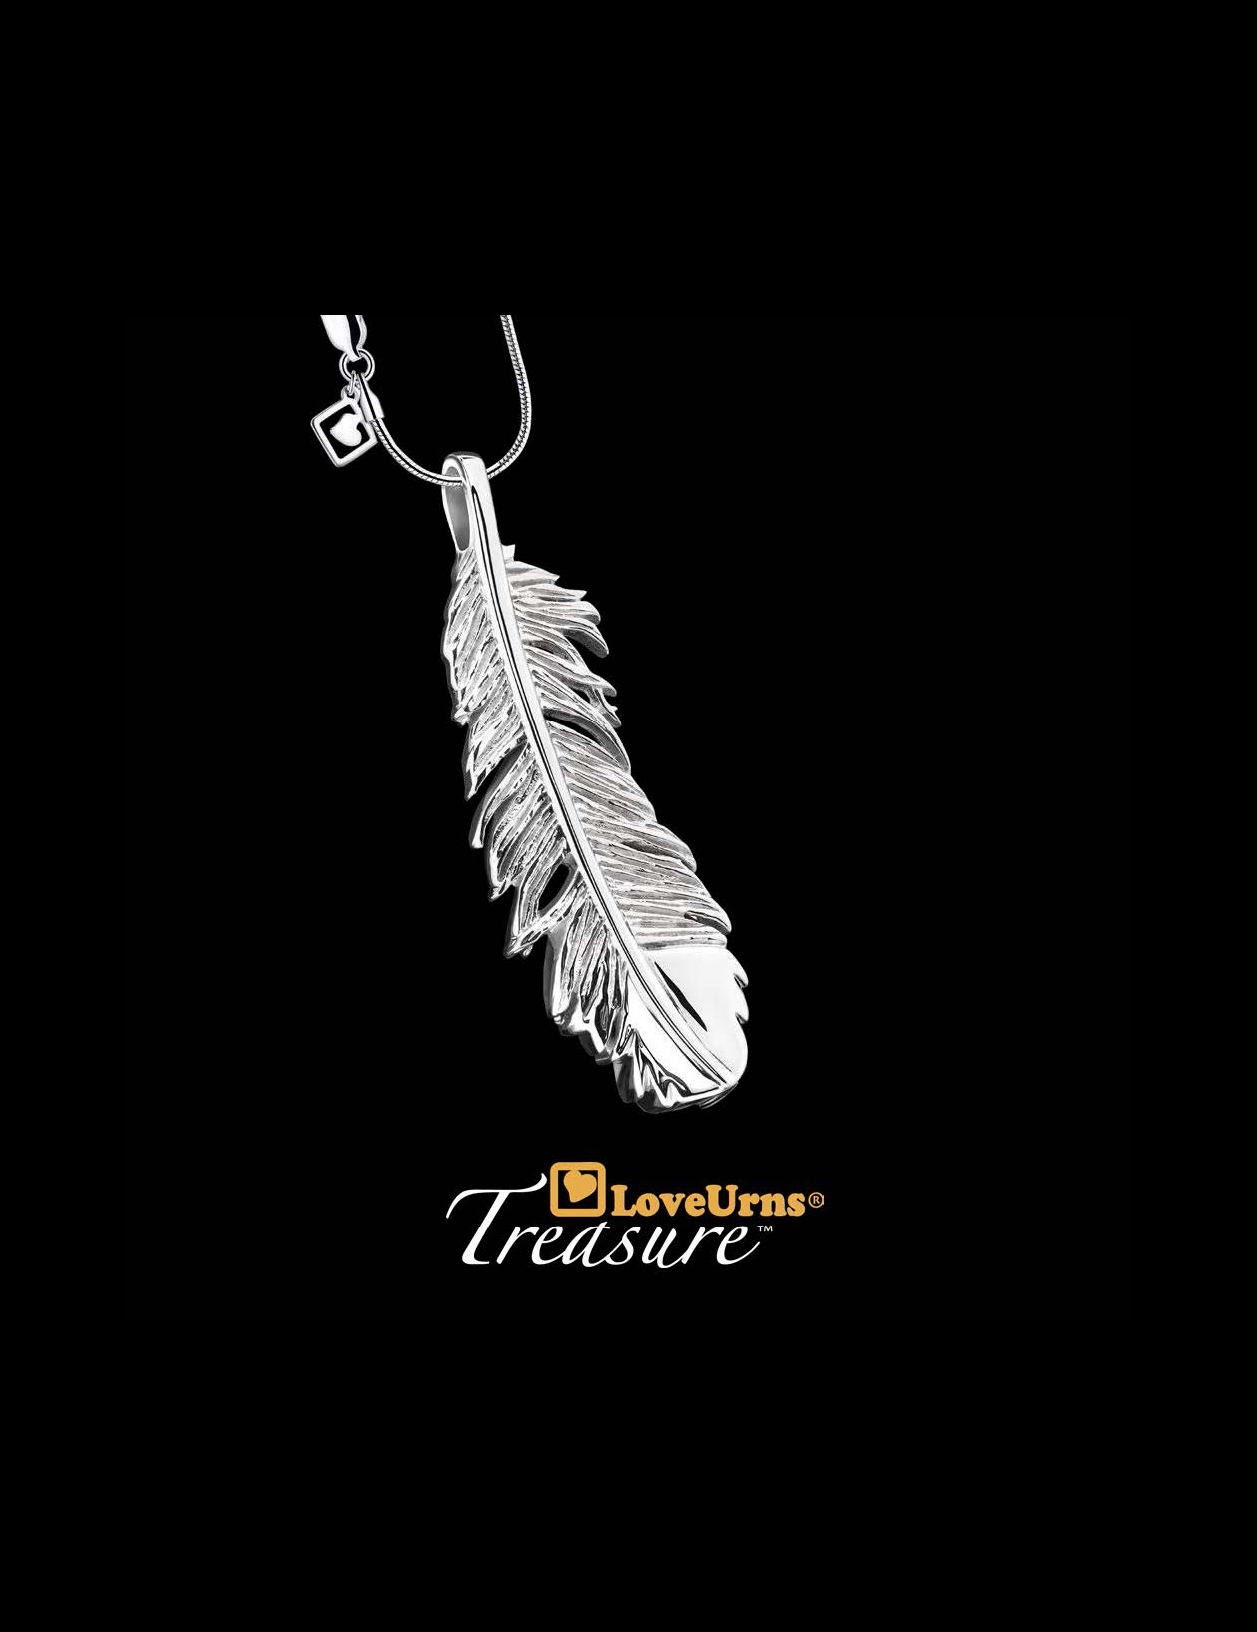 2019 LoveUrns Jewelry Catalog